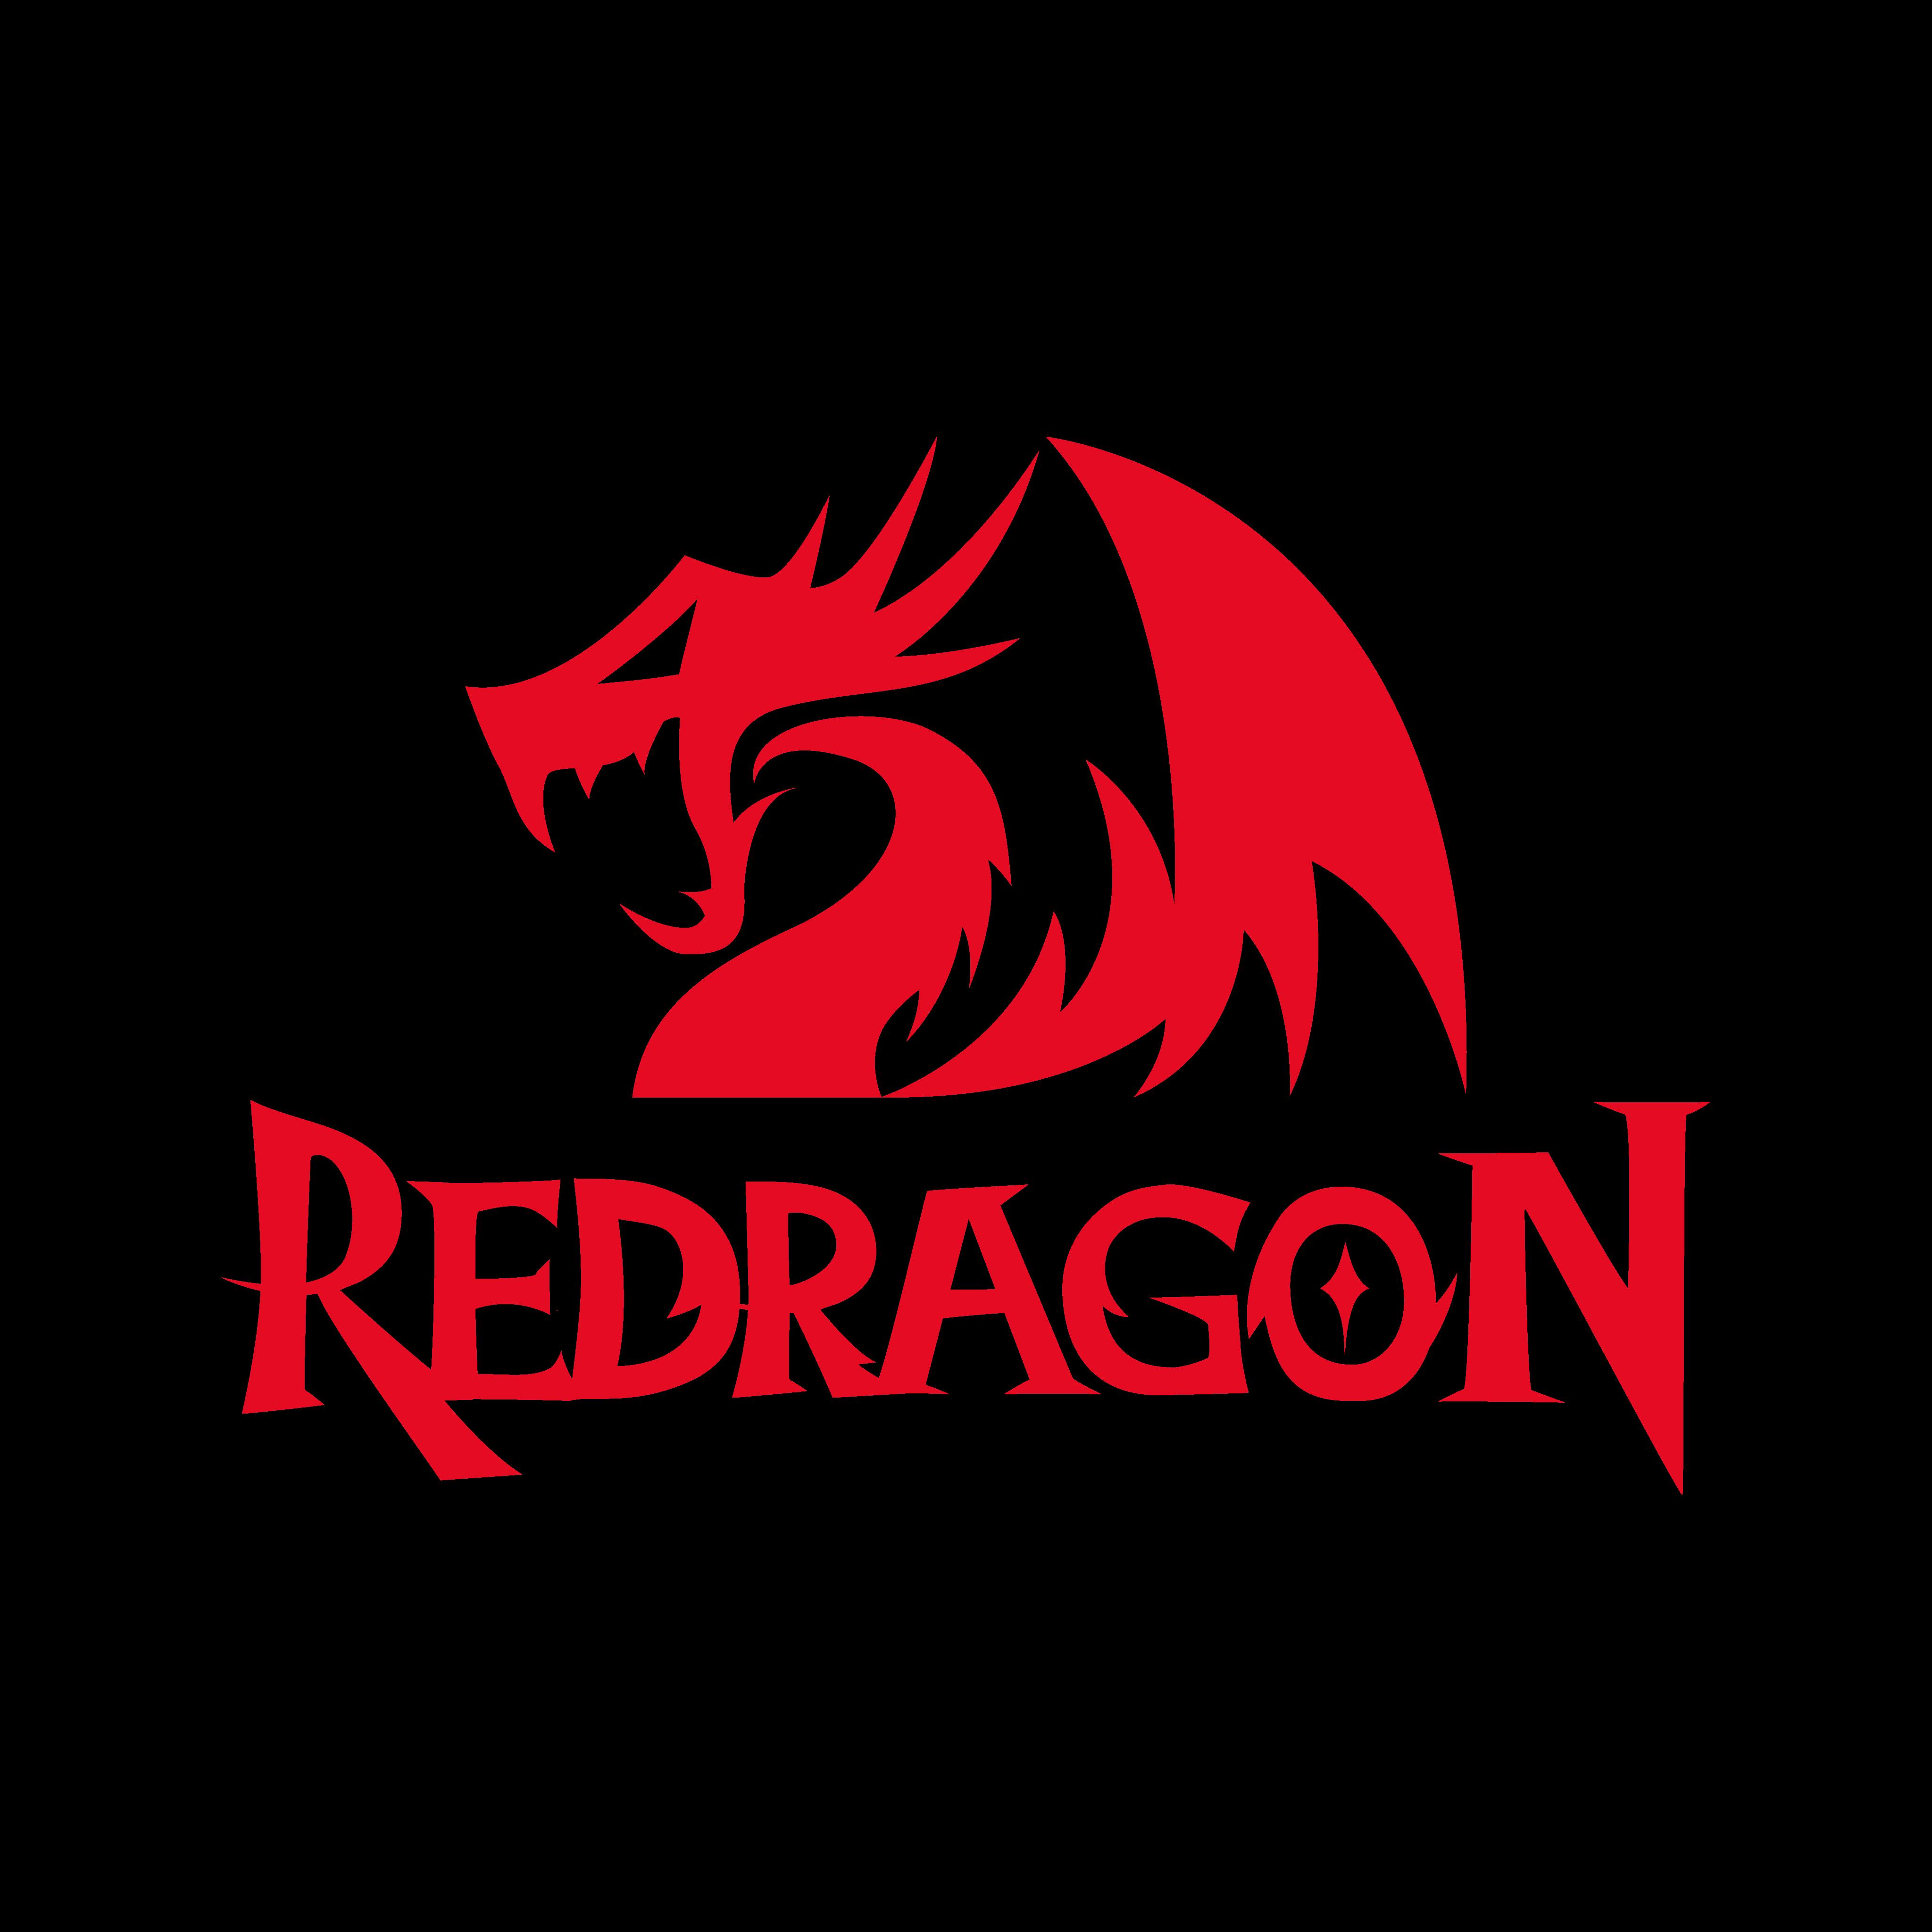 redragon logo 0 - Redragon Logo